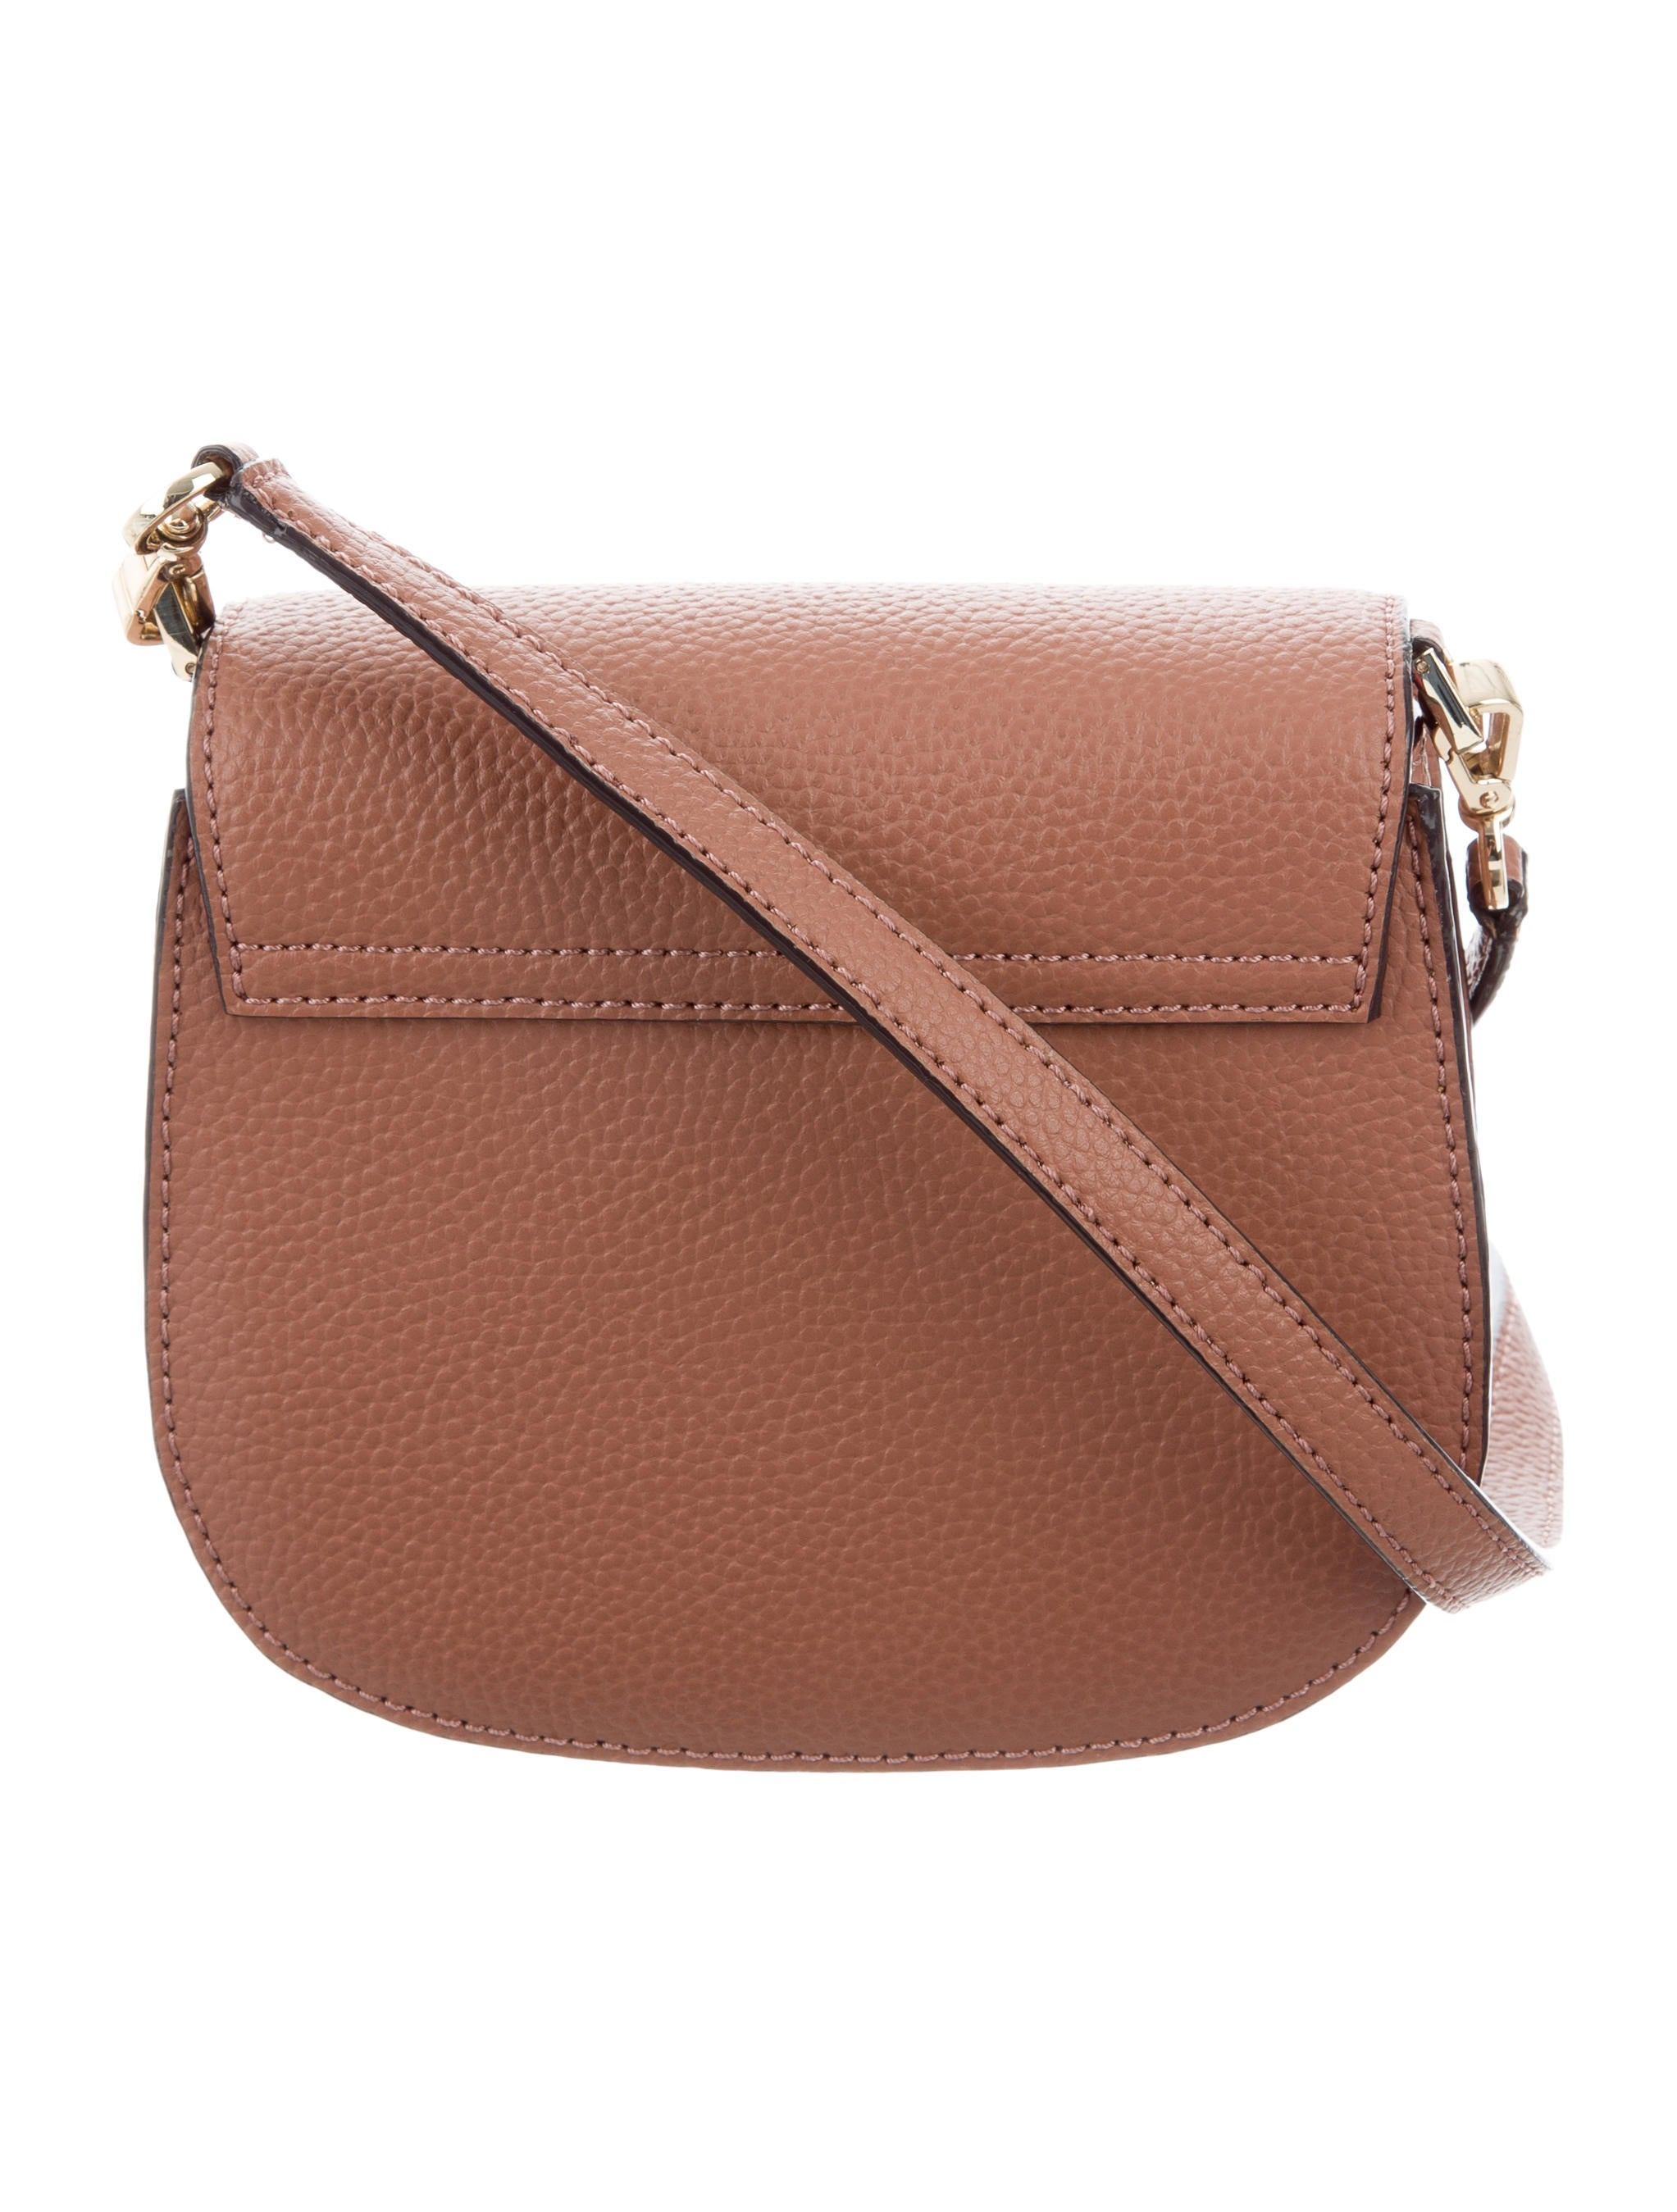 Kate Spade New York Mini Saddle Crossbody Bag Handbags